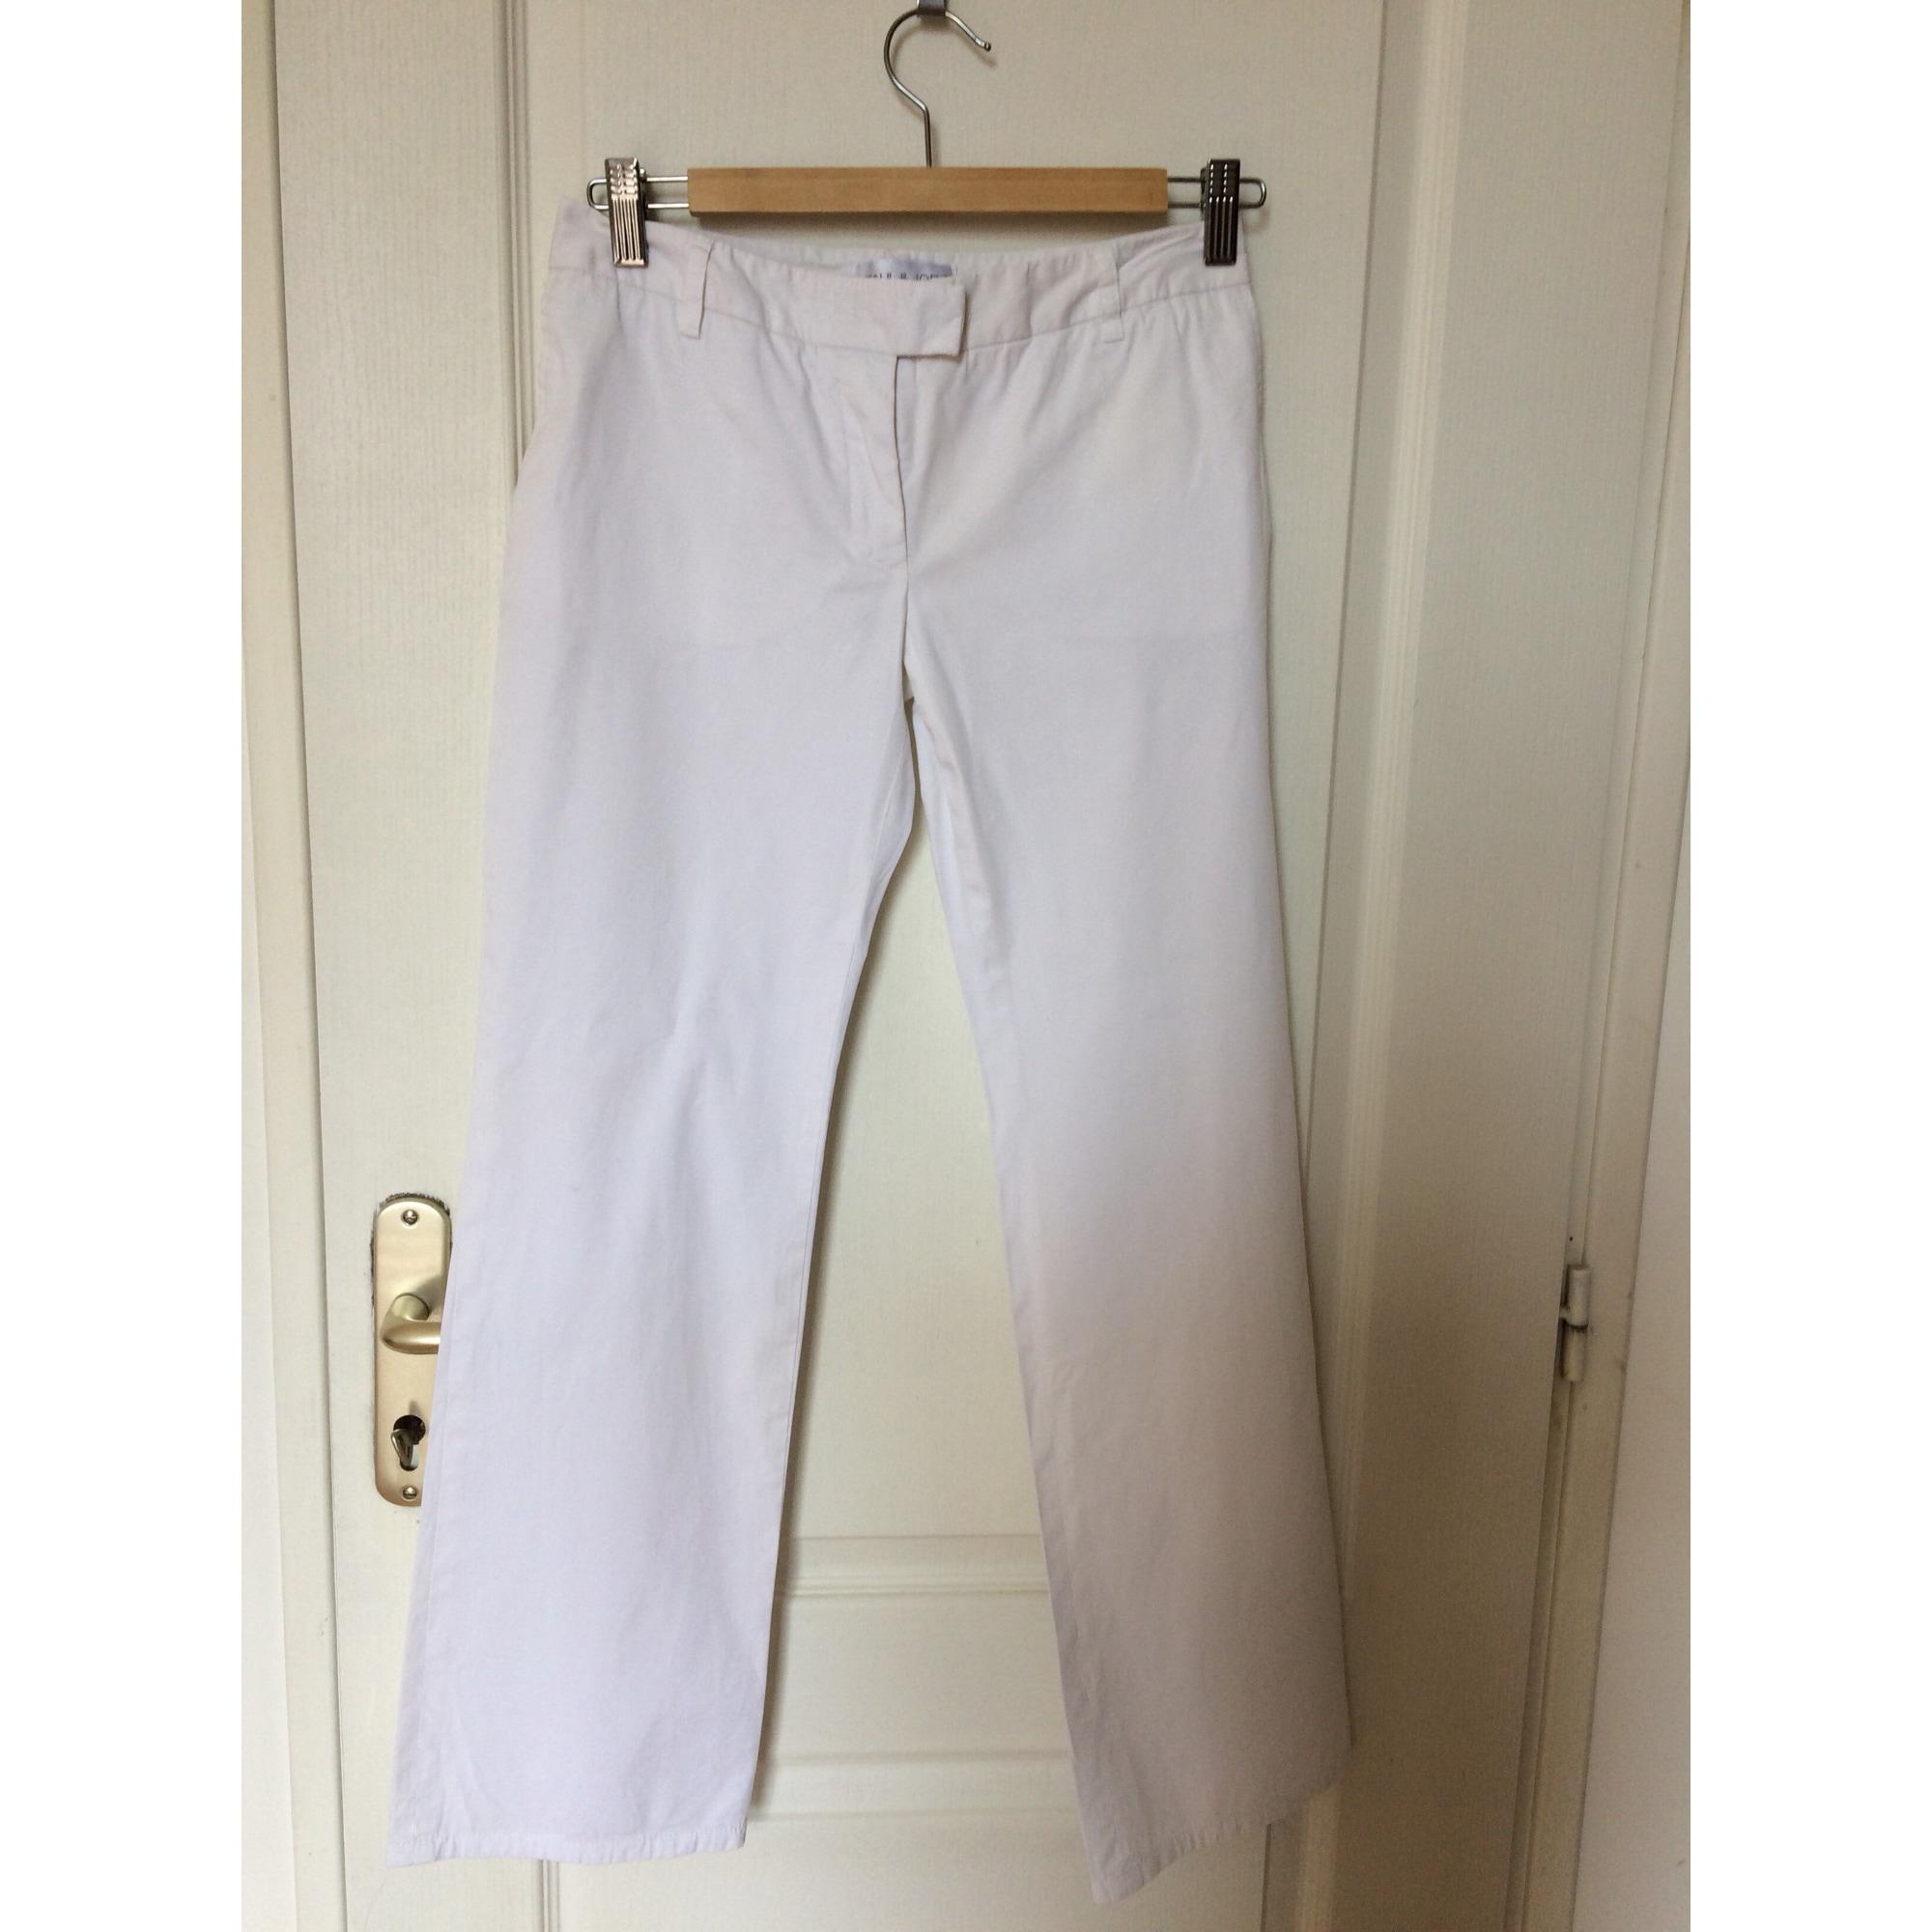 Pantalon droit PAUL & JOE Blanc, blanc cassé, écru